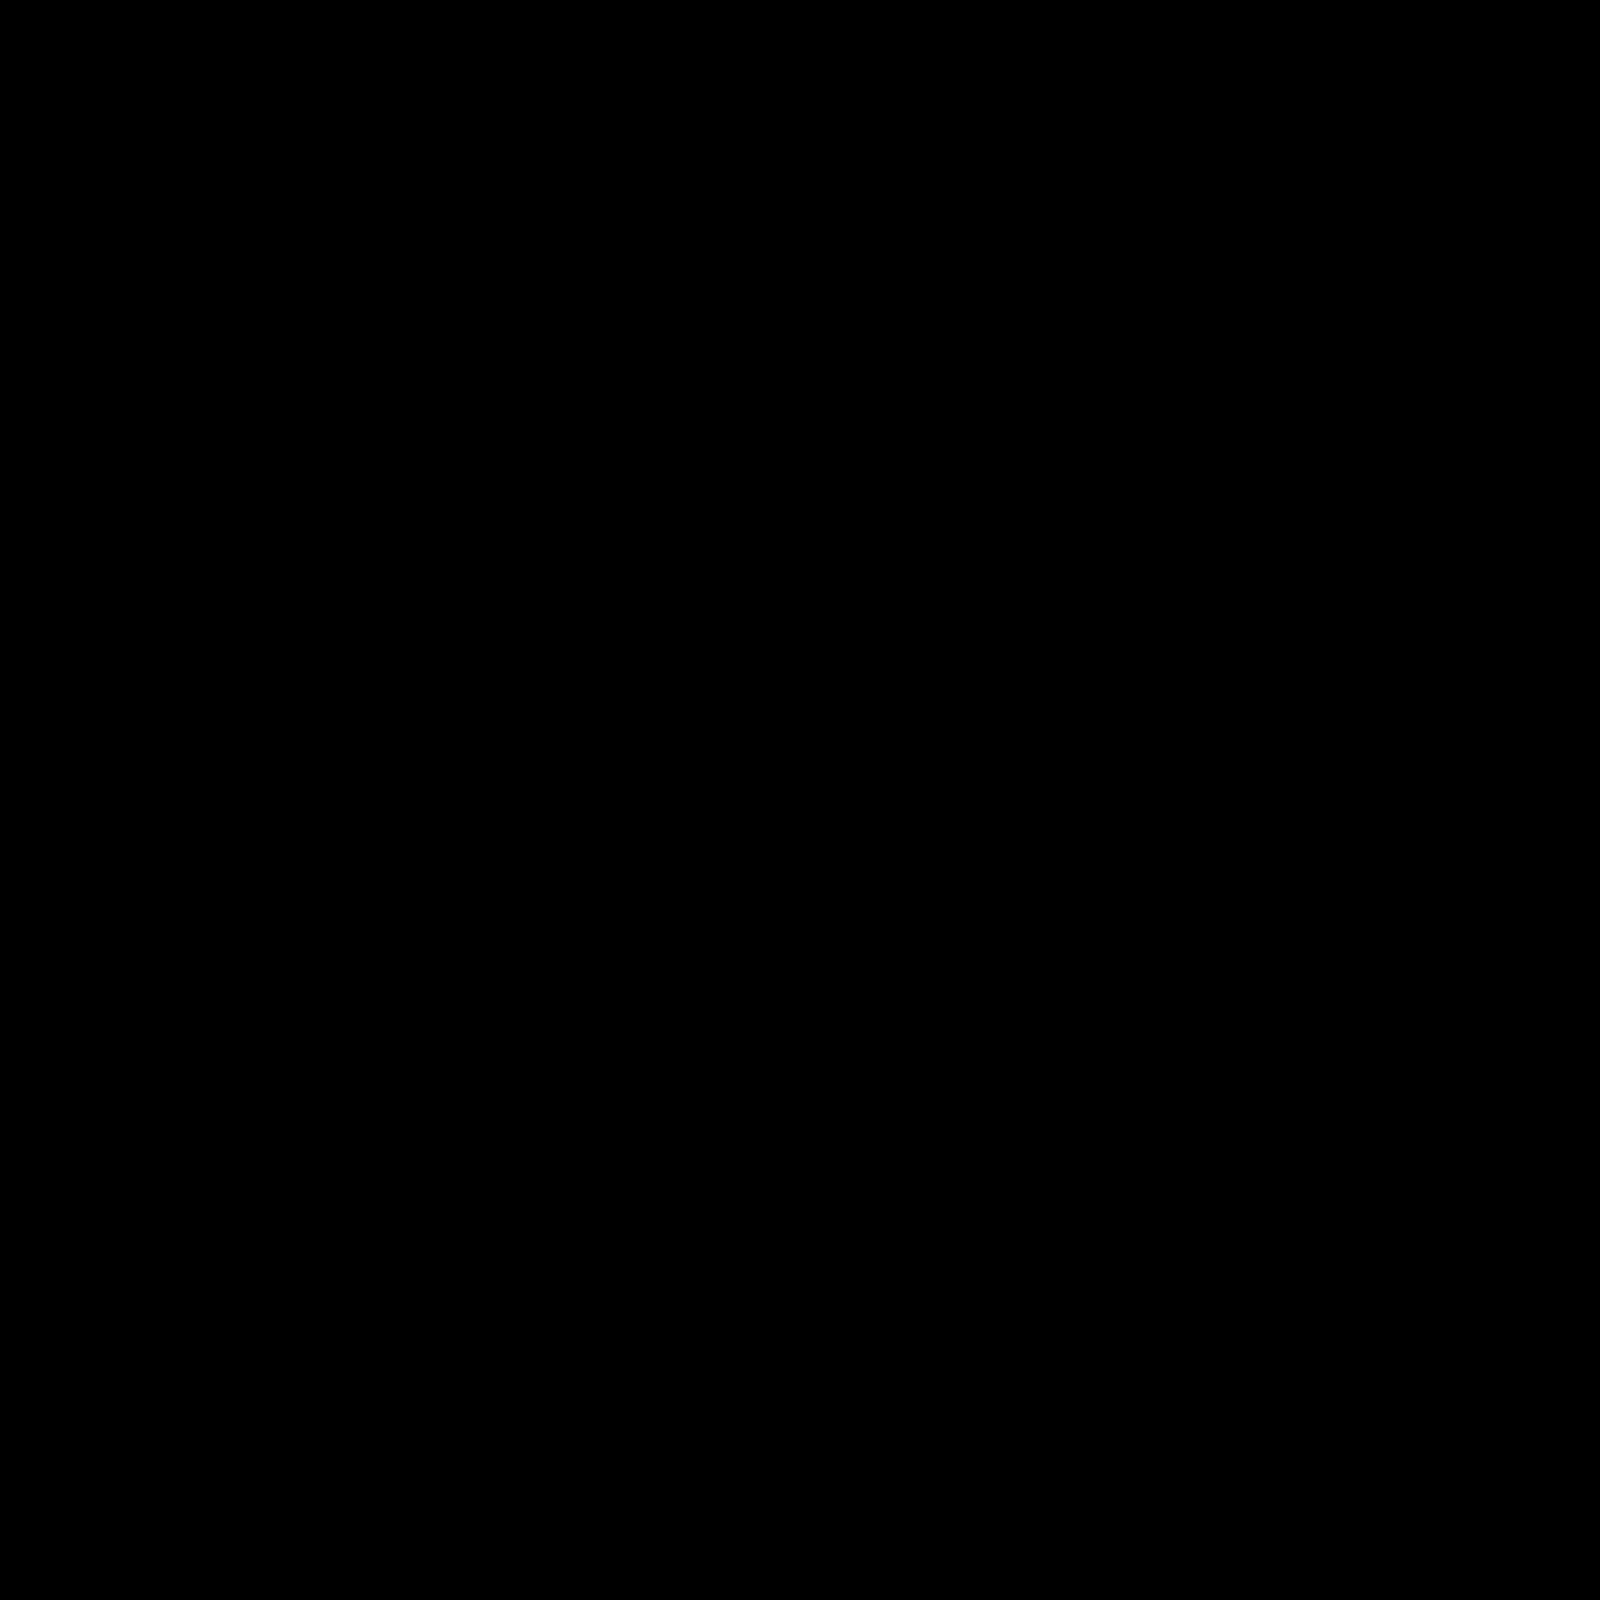 Hiragana Te Filled icon